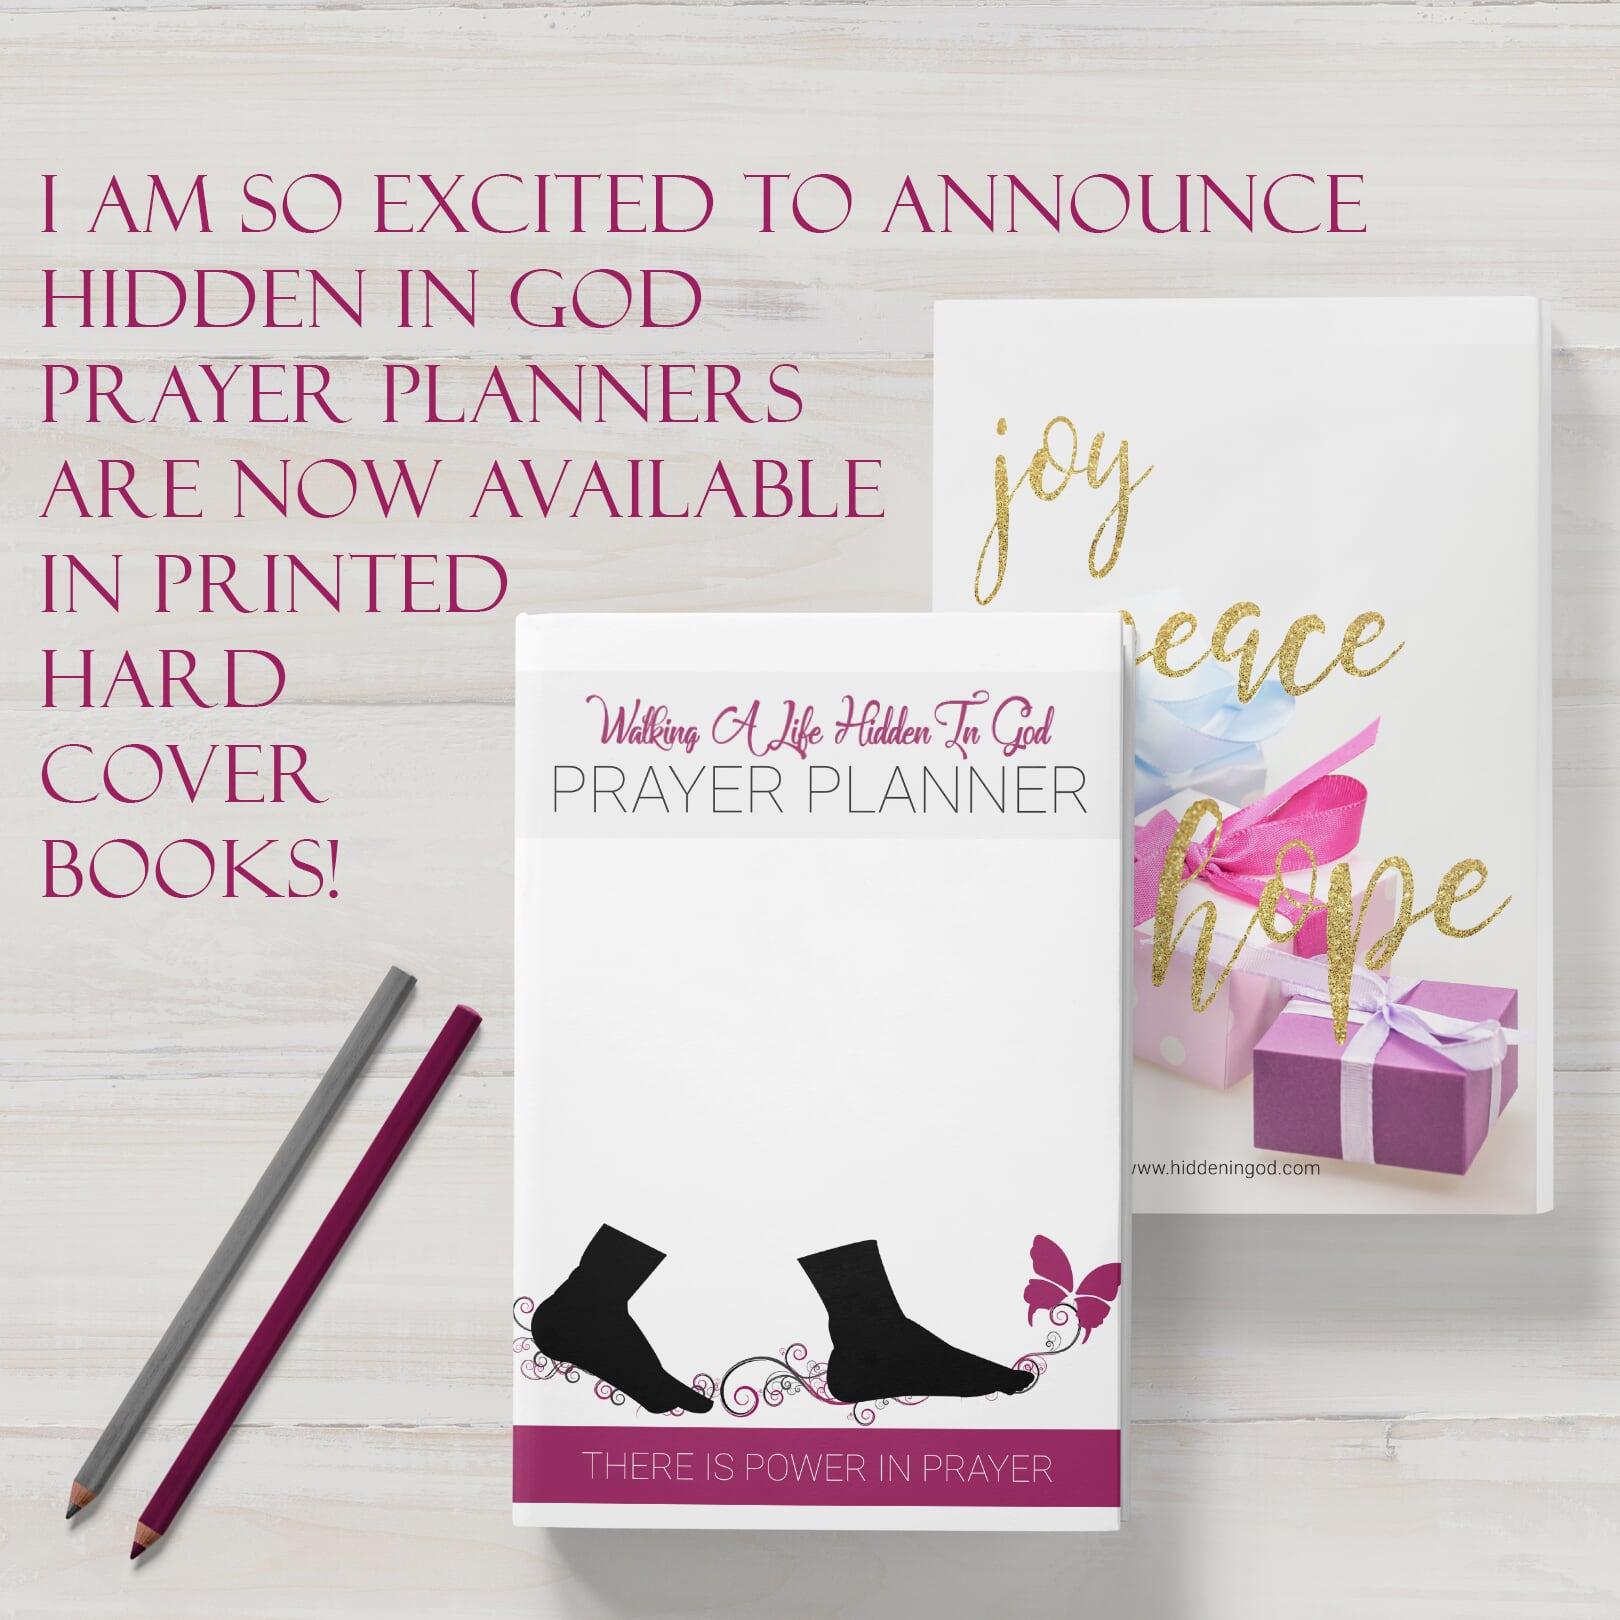 Prayer planner ad